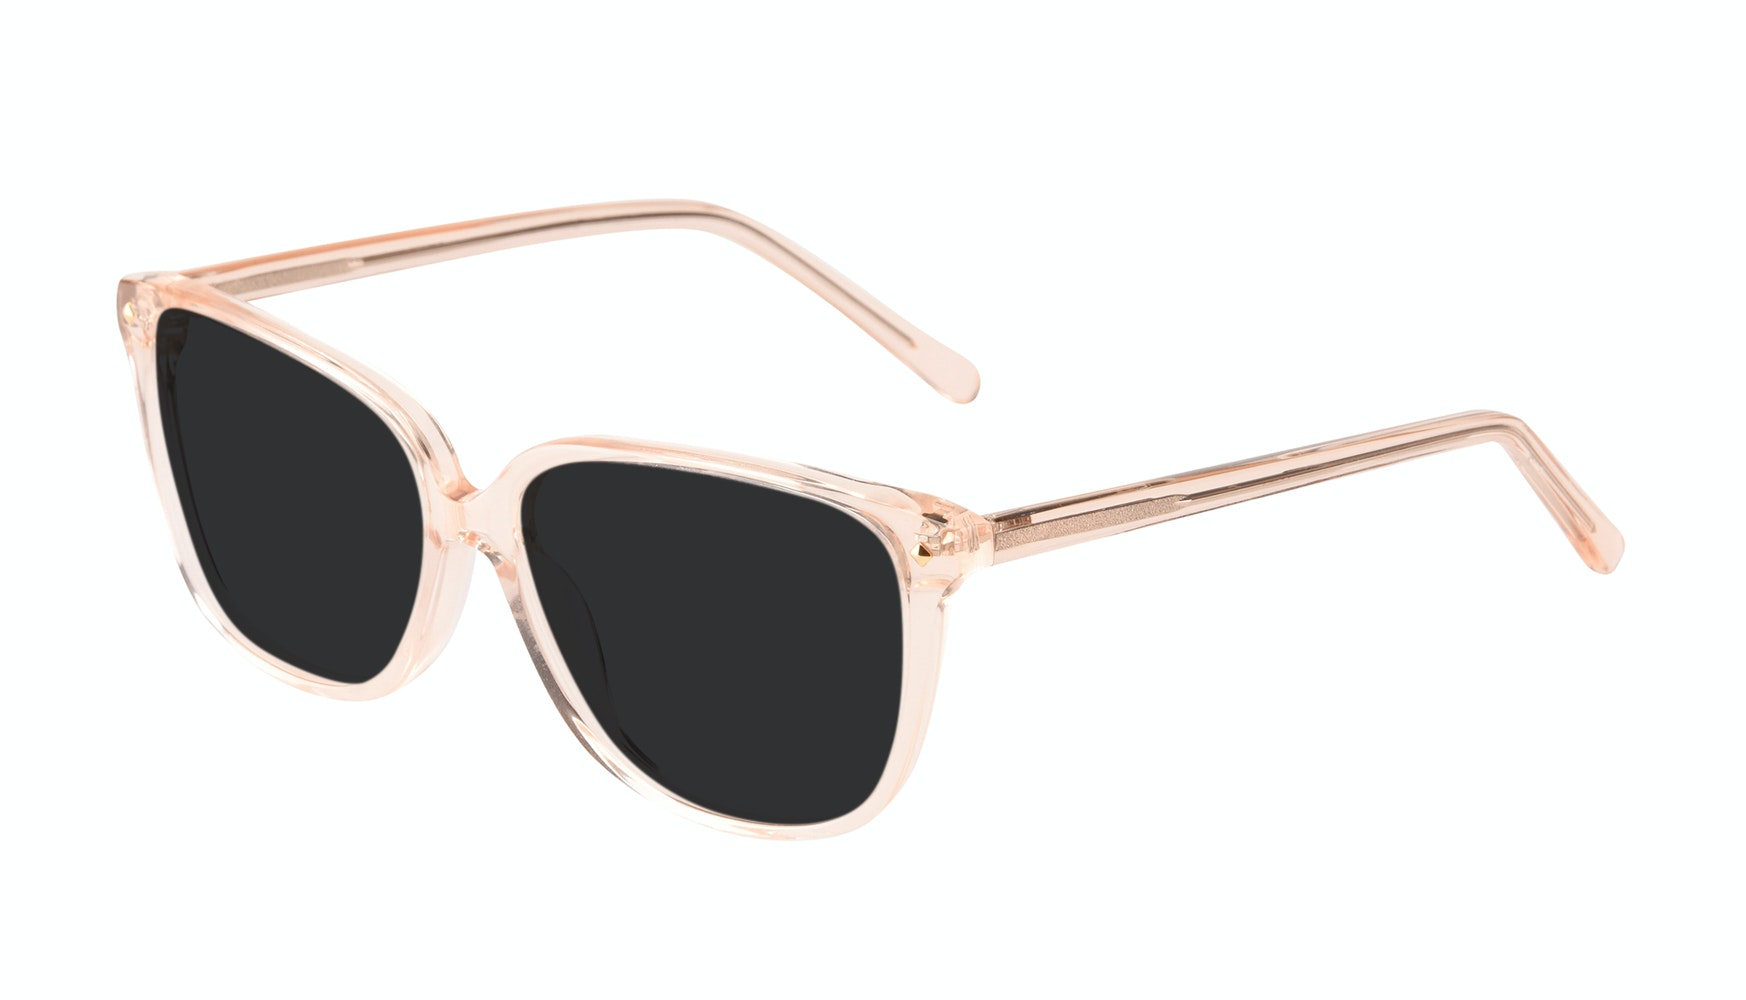 Affordable Fashion Glasses Rectangle Square Sunglasses Women Muse Blond Tilt